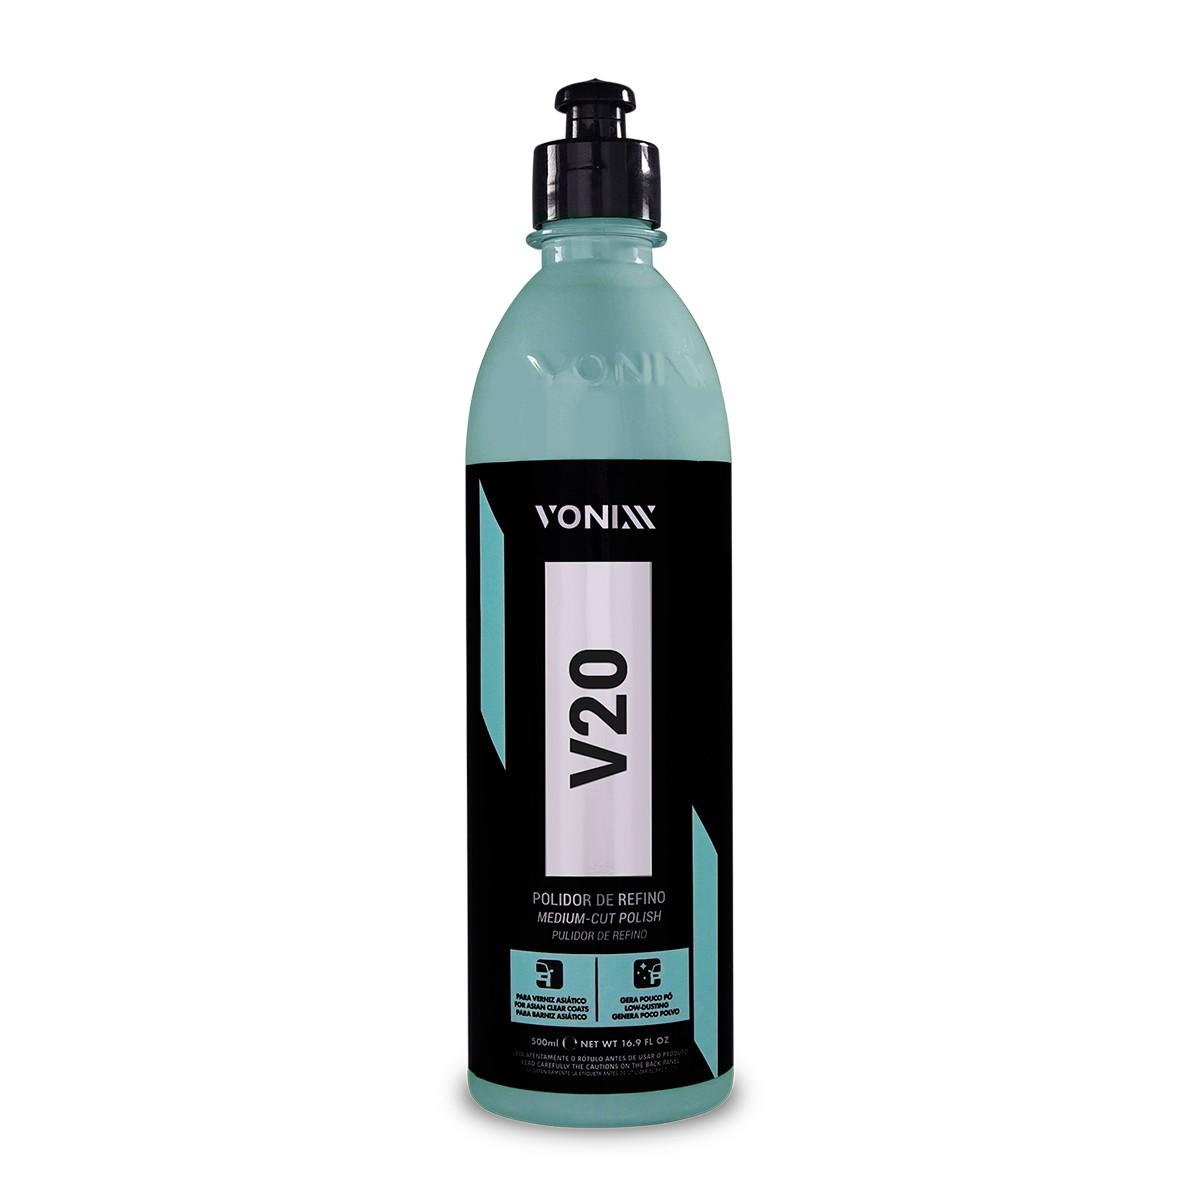 V20 Composto Polidor Refino 500ml - Vonixx